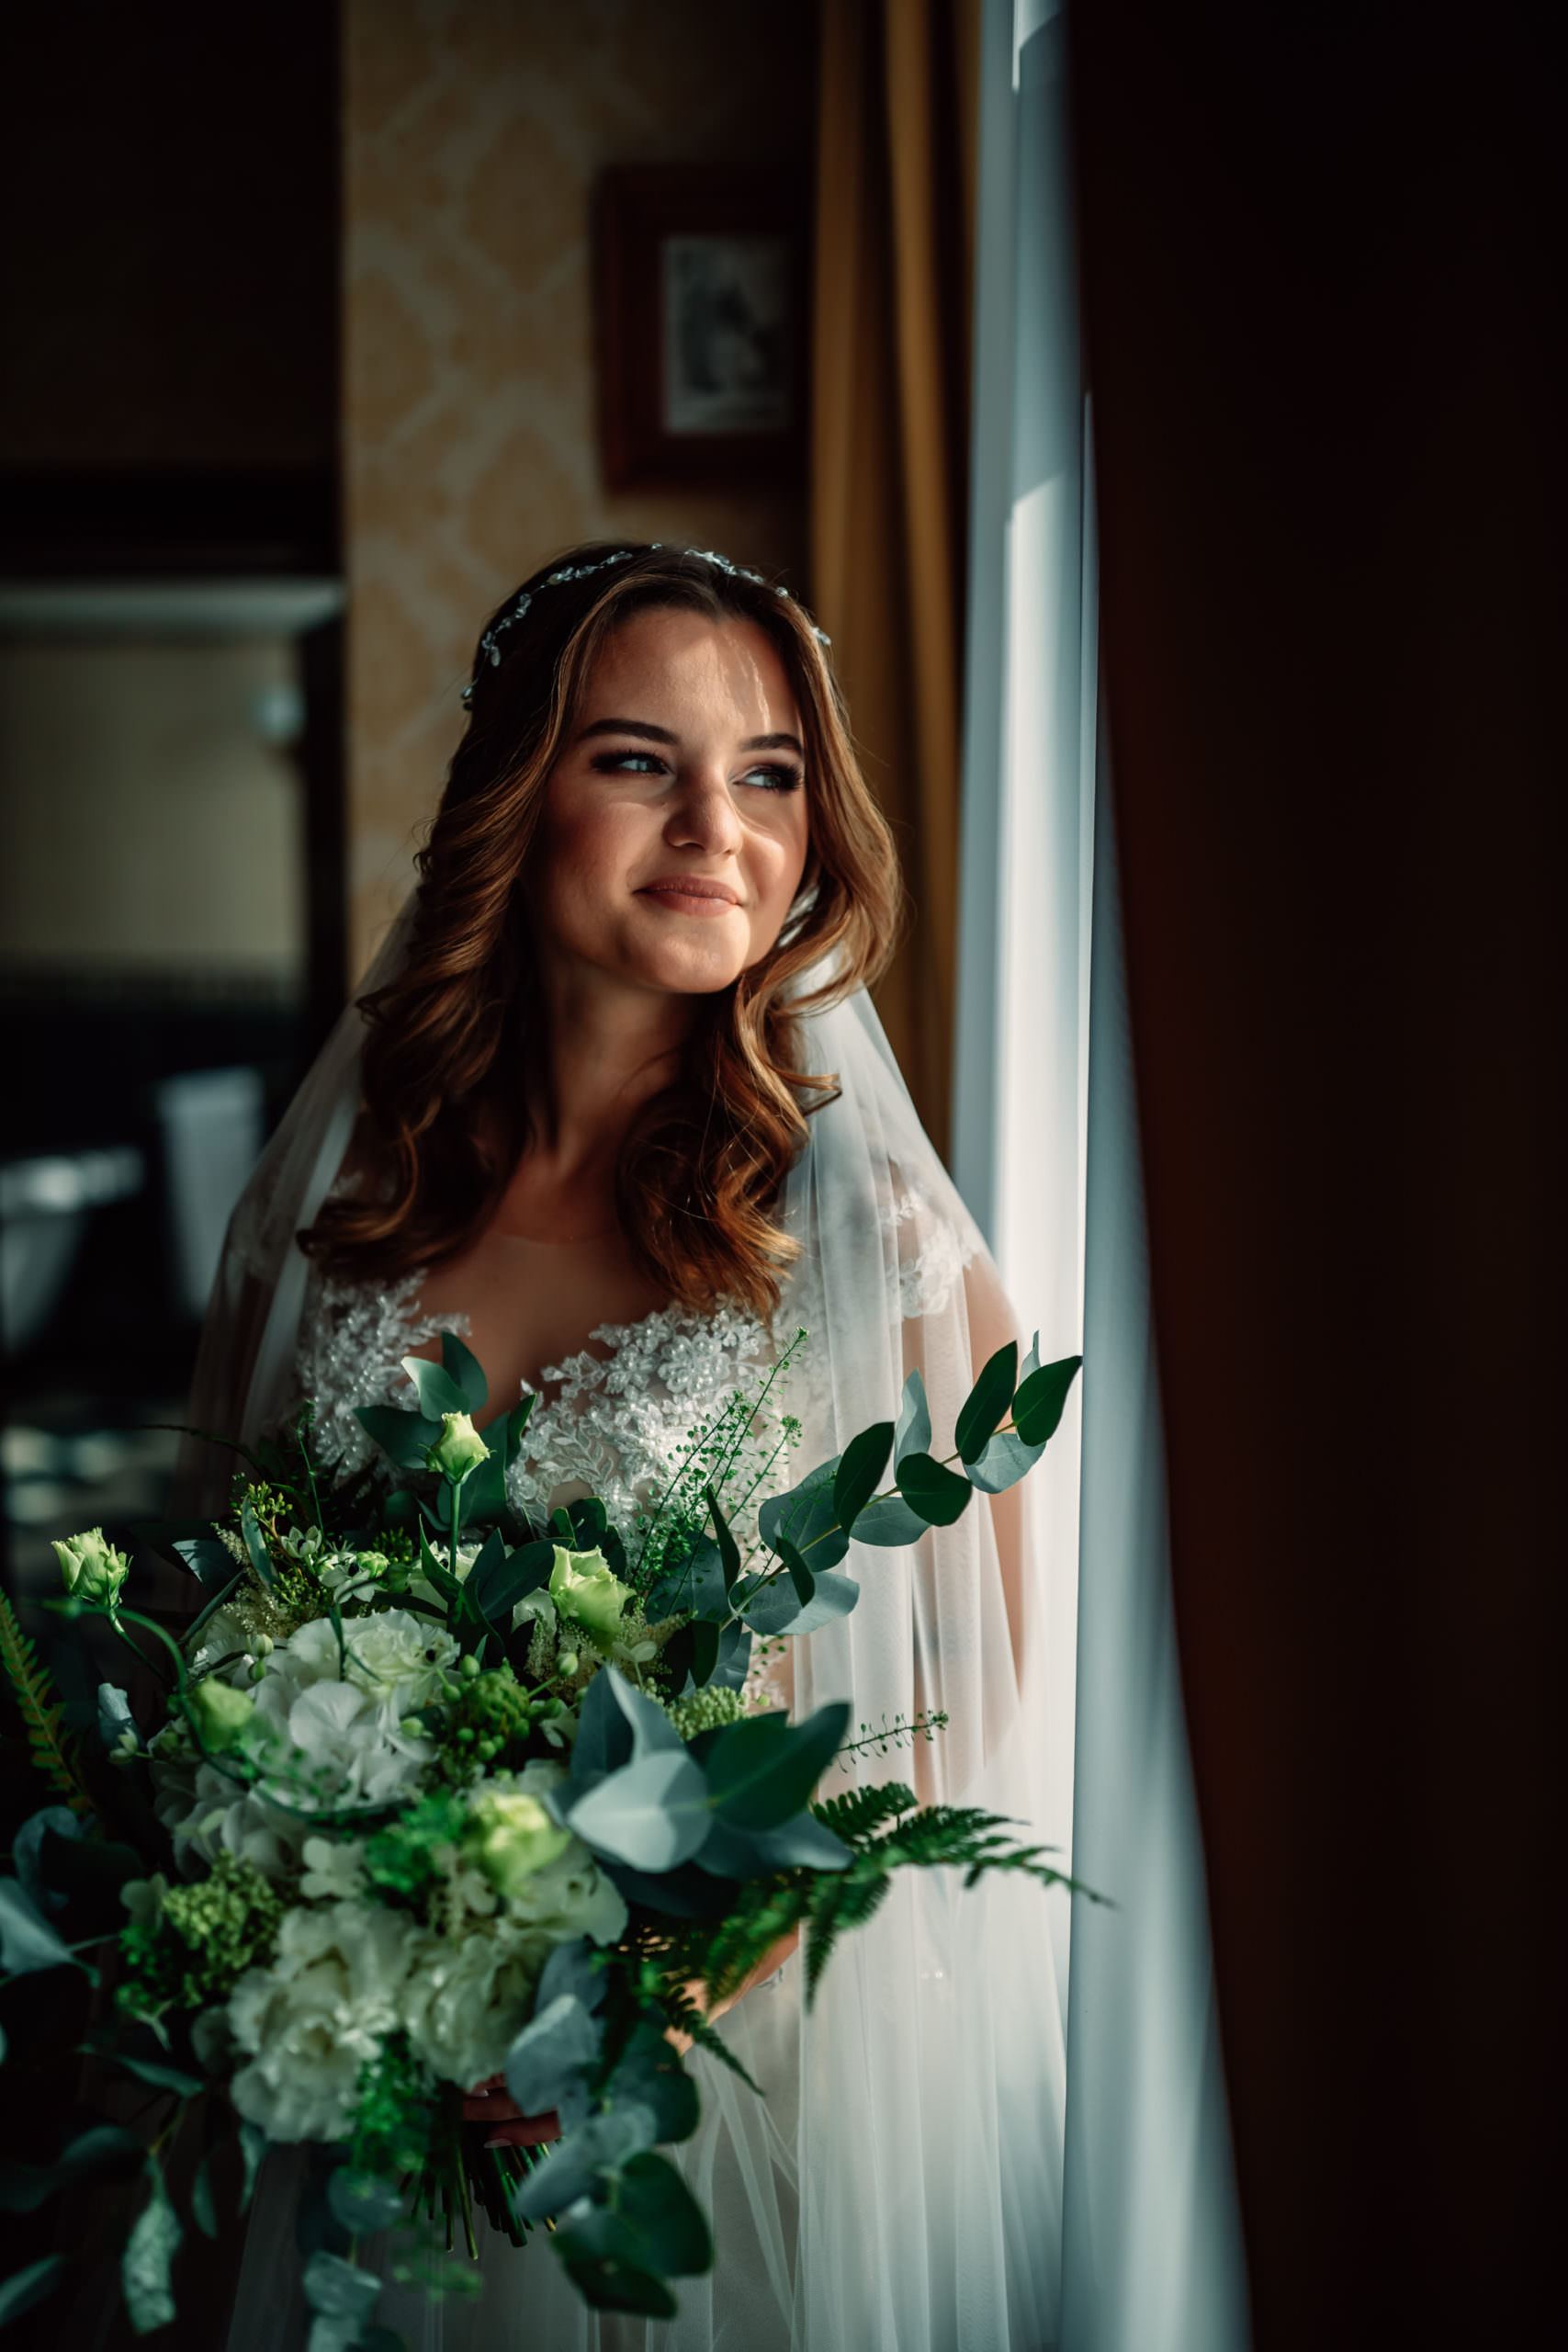 Joanna Kruk bukiet ślubny